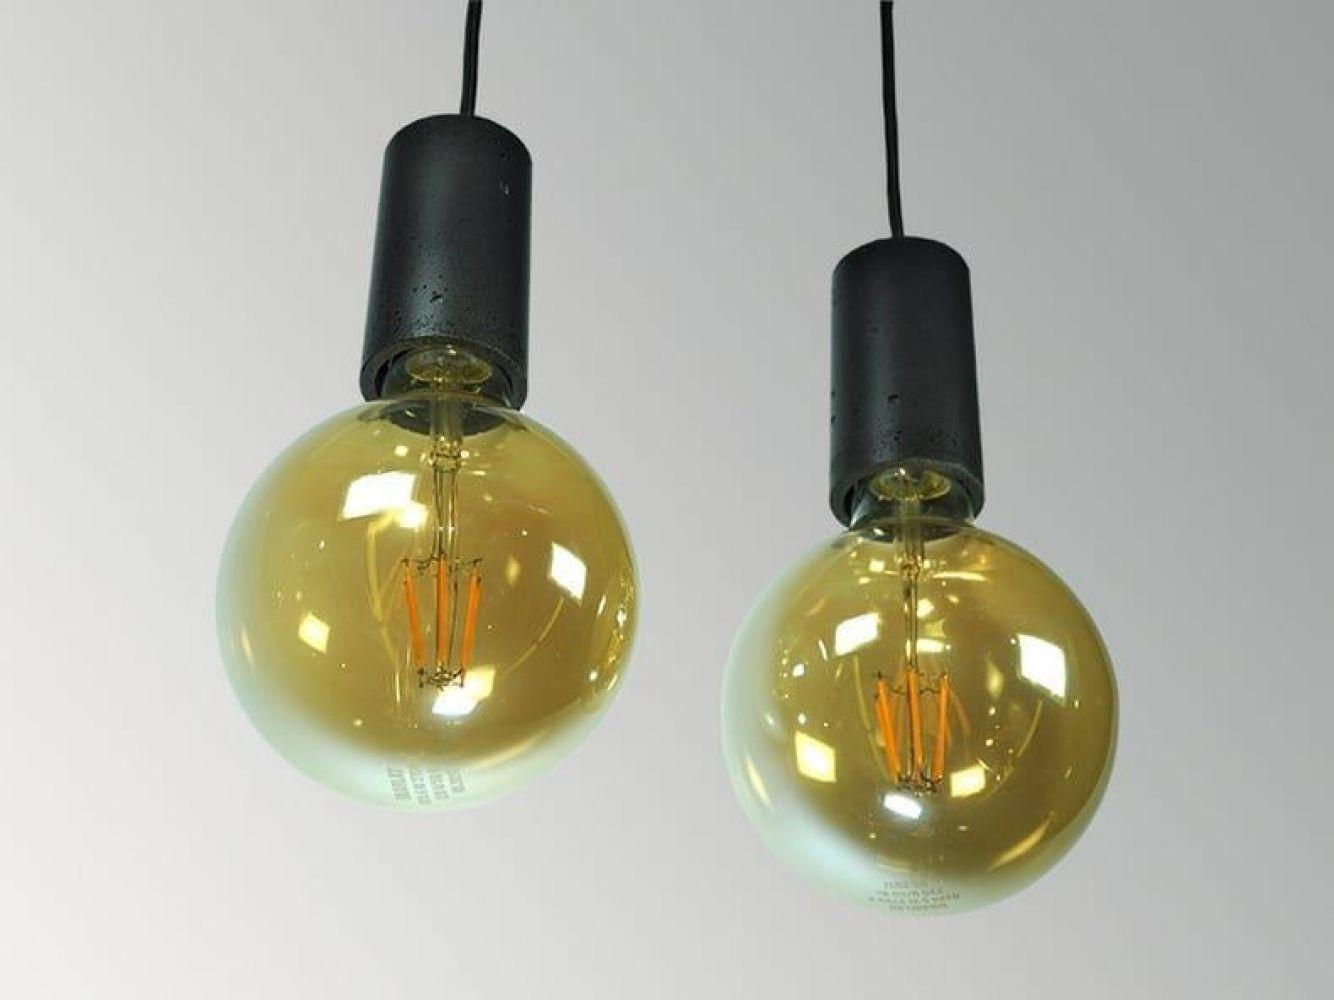 Ecolight Deco 001331